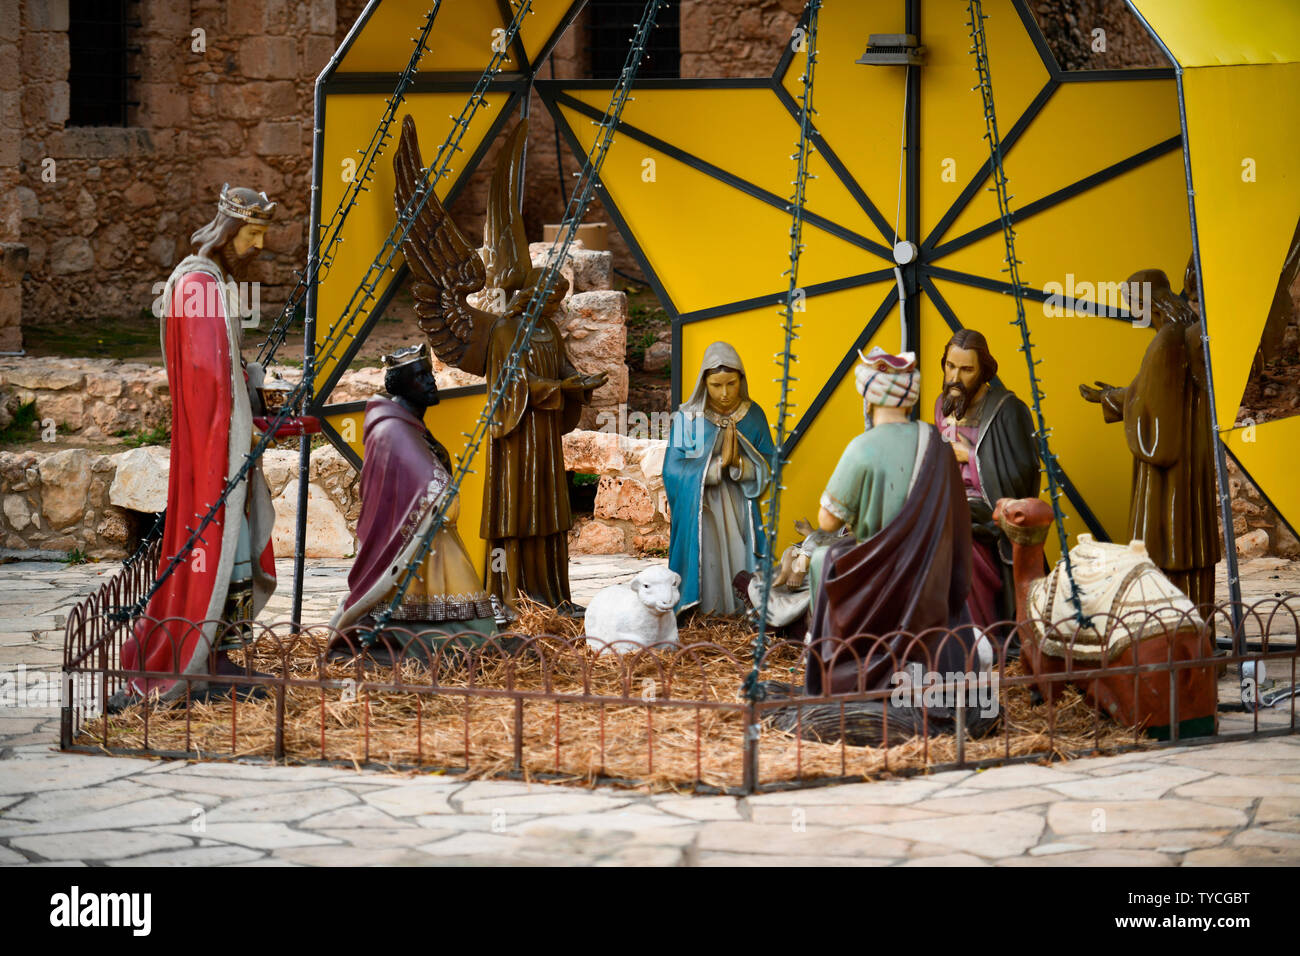 Weihnachtsdekoration, Agia Napa, Republik Zypern Stock Photo